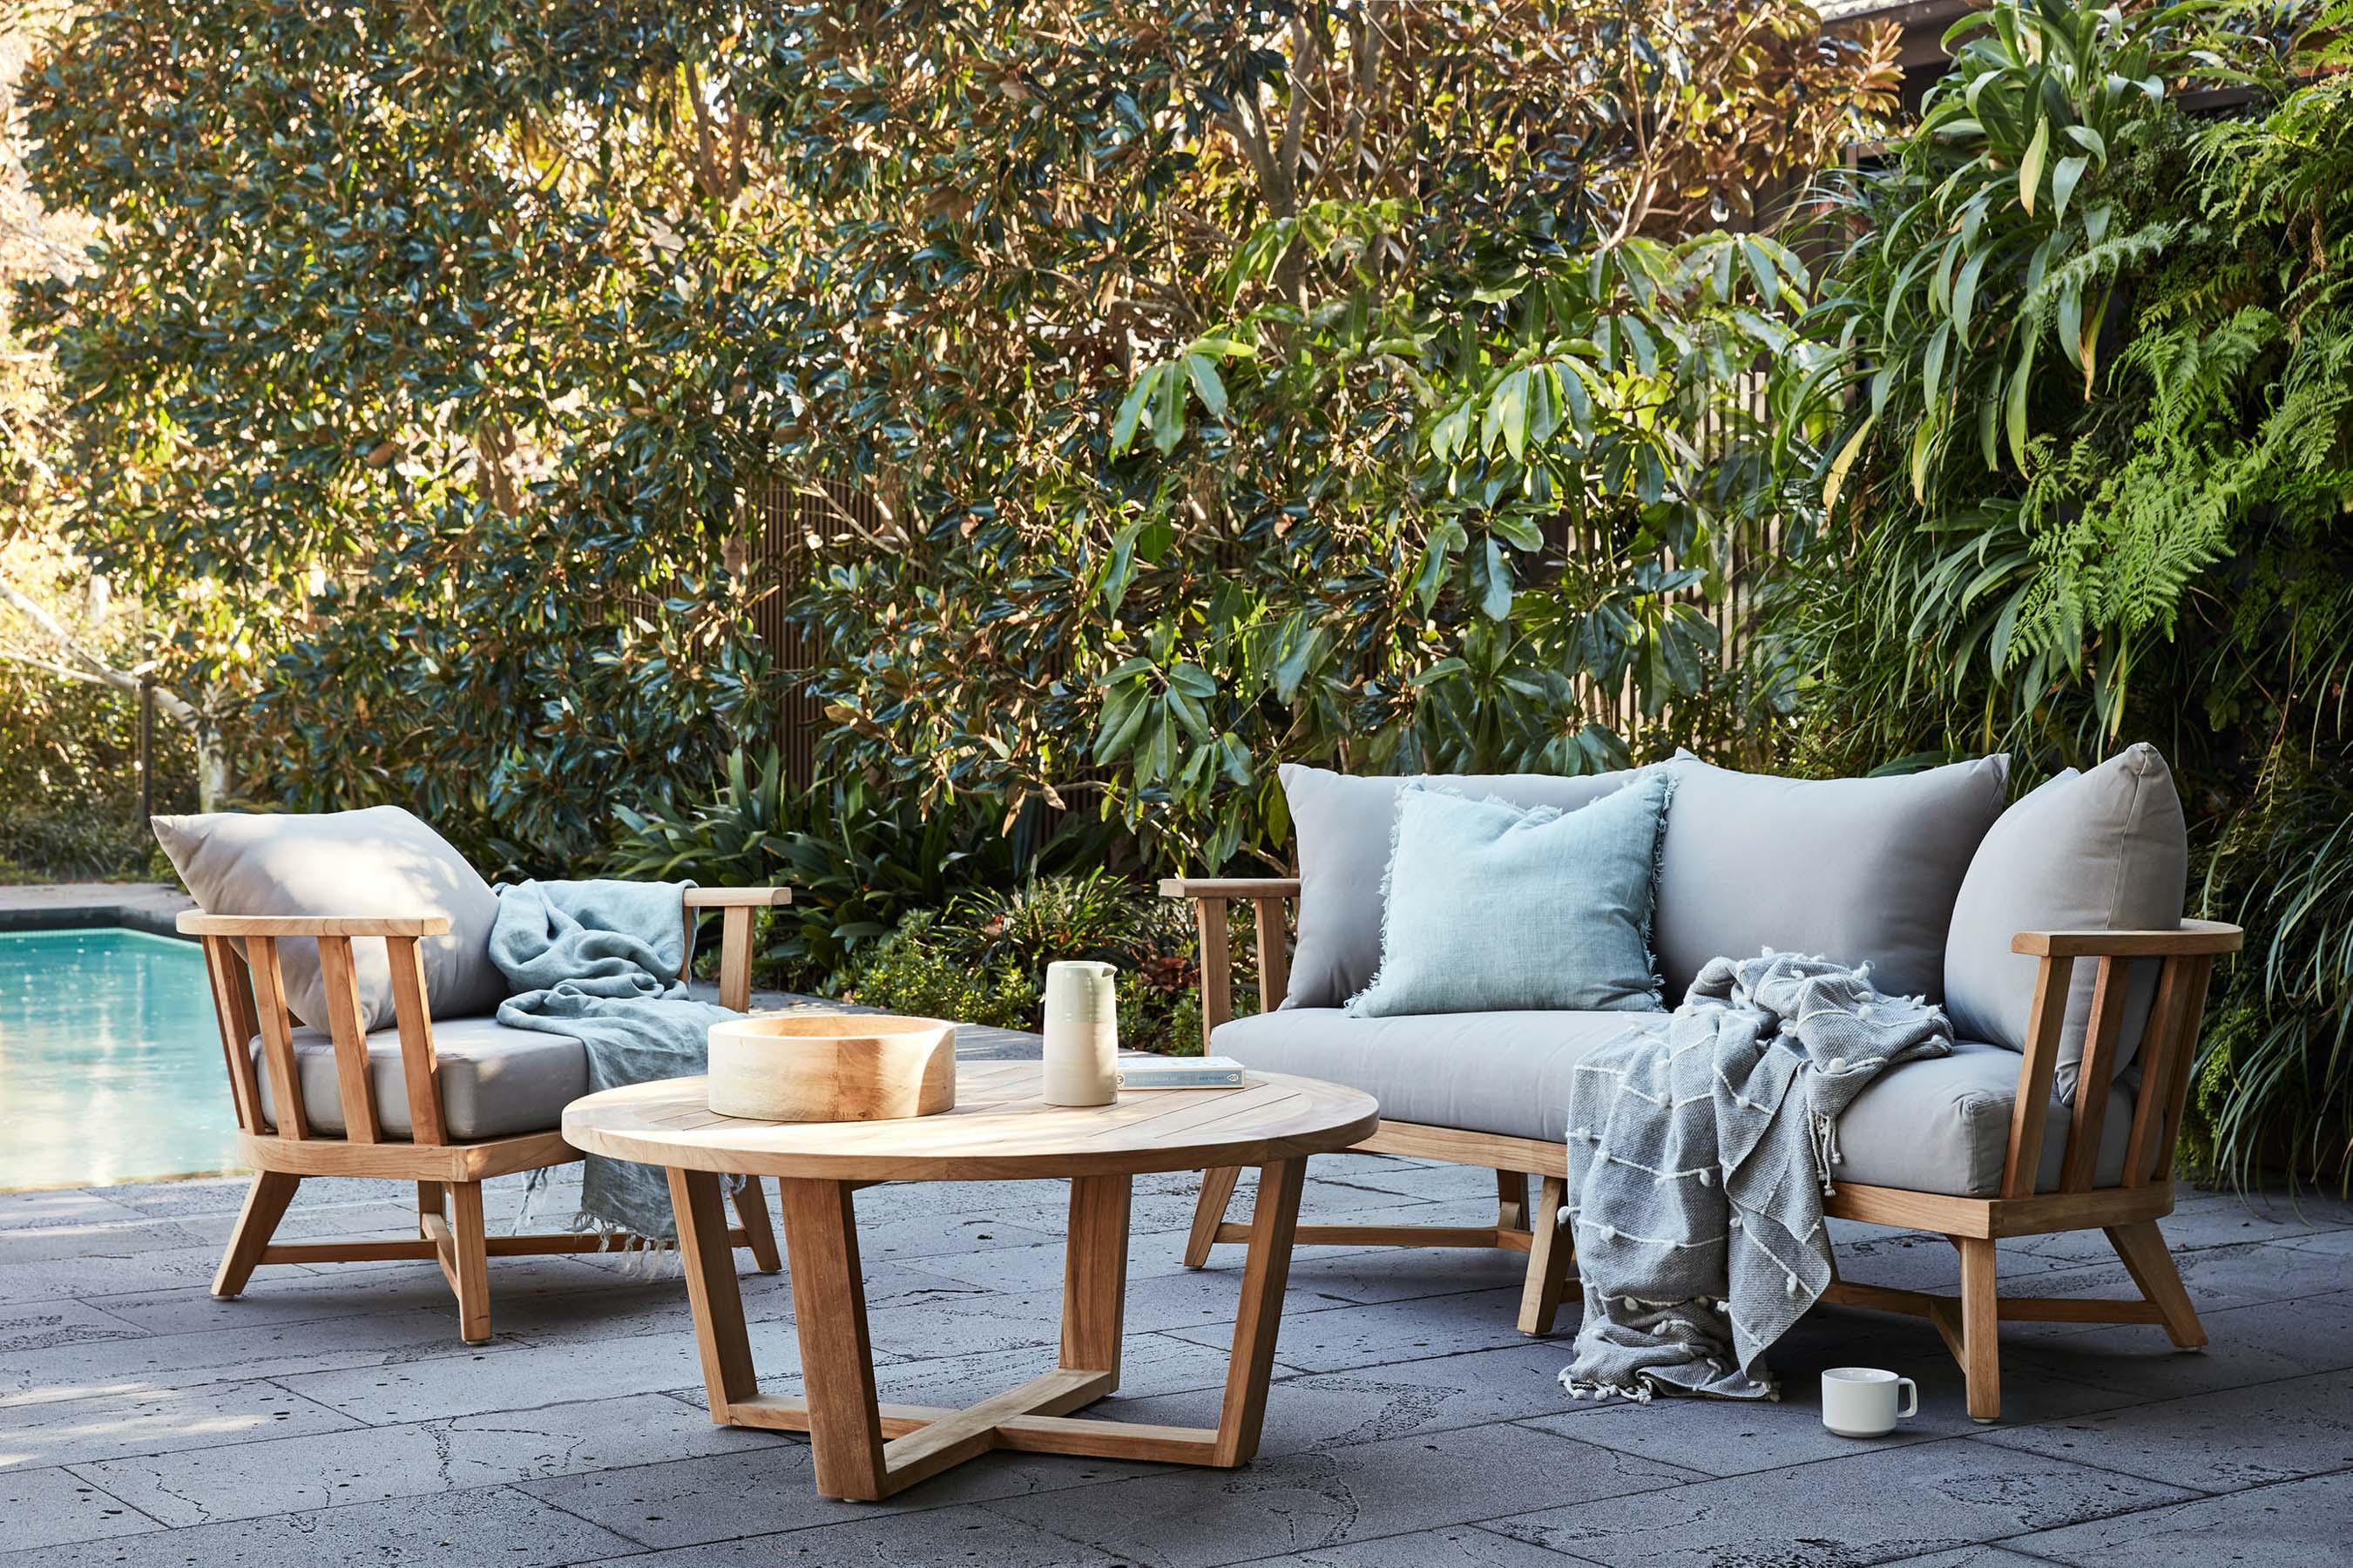 Furniture Gallery Sofas sonoma-slat-three-seater-sofa-02